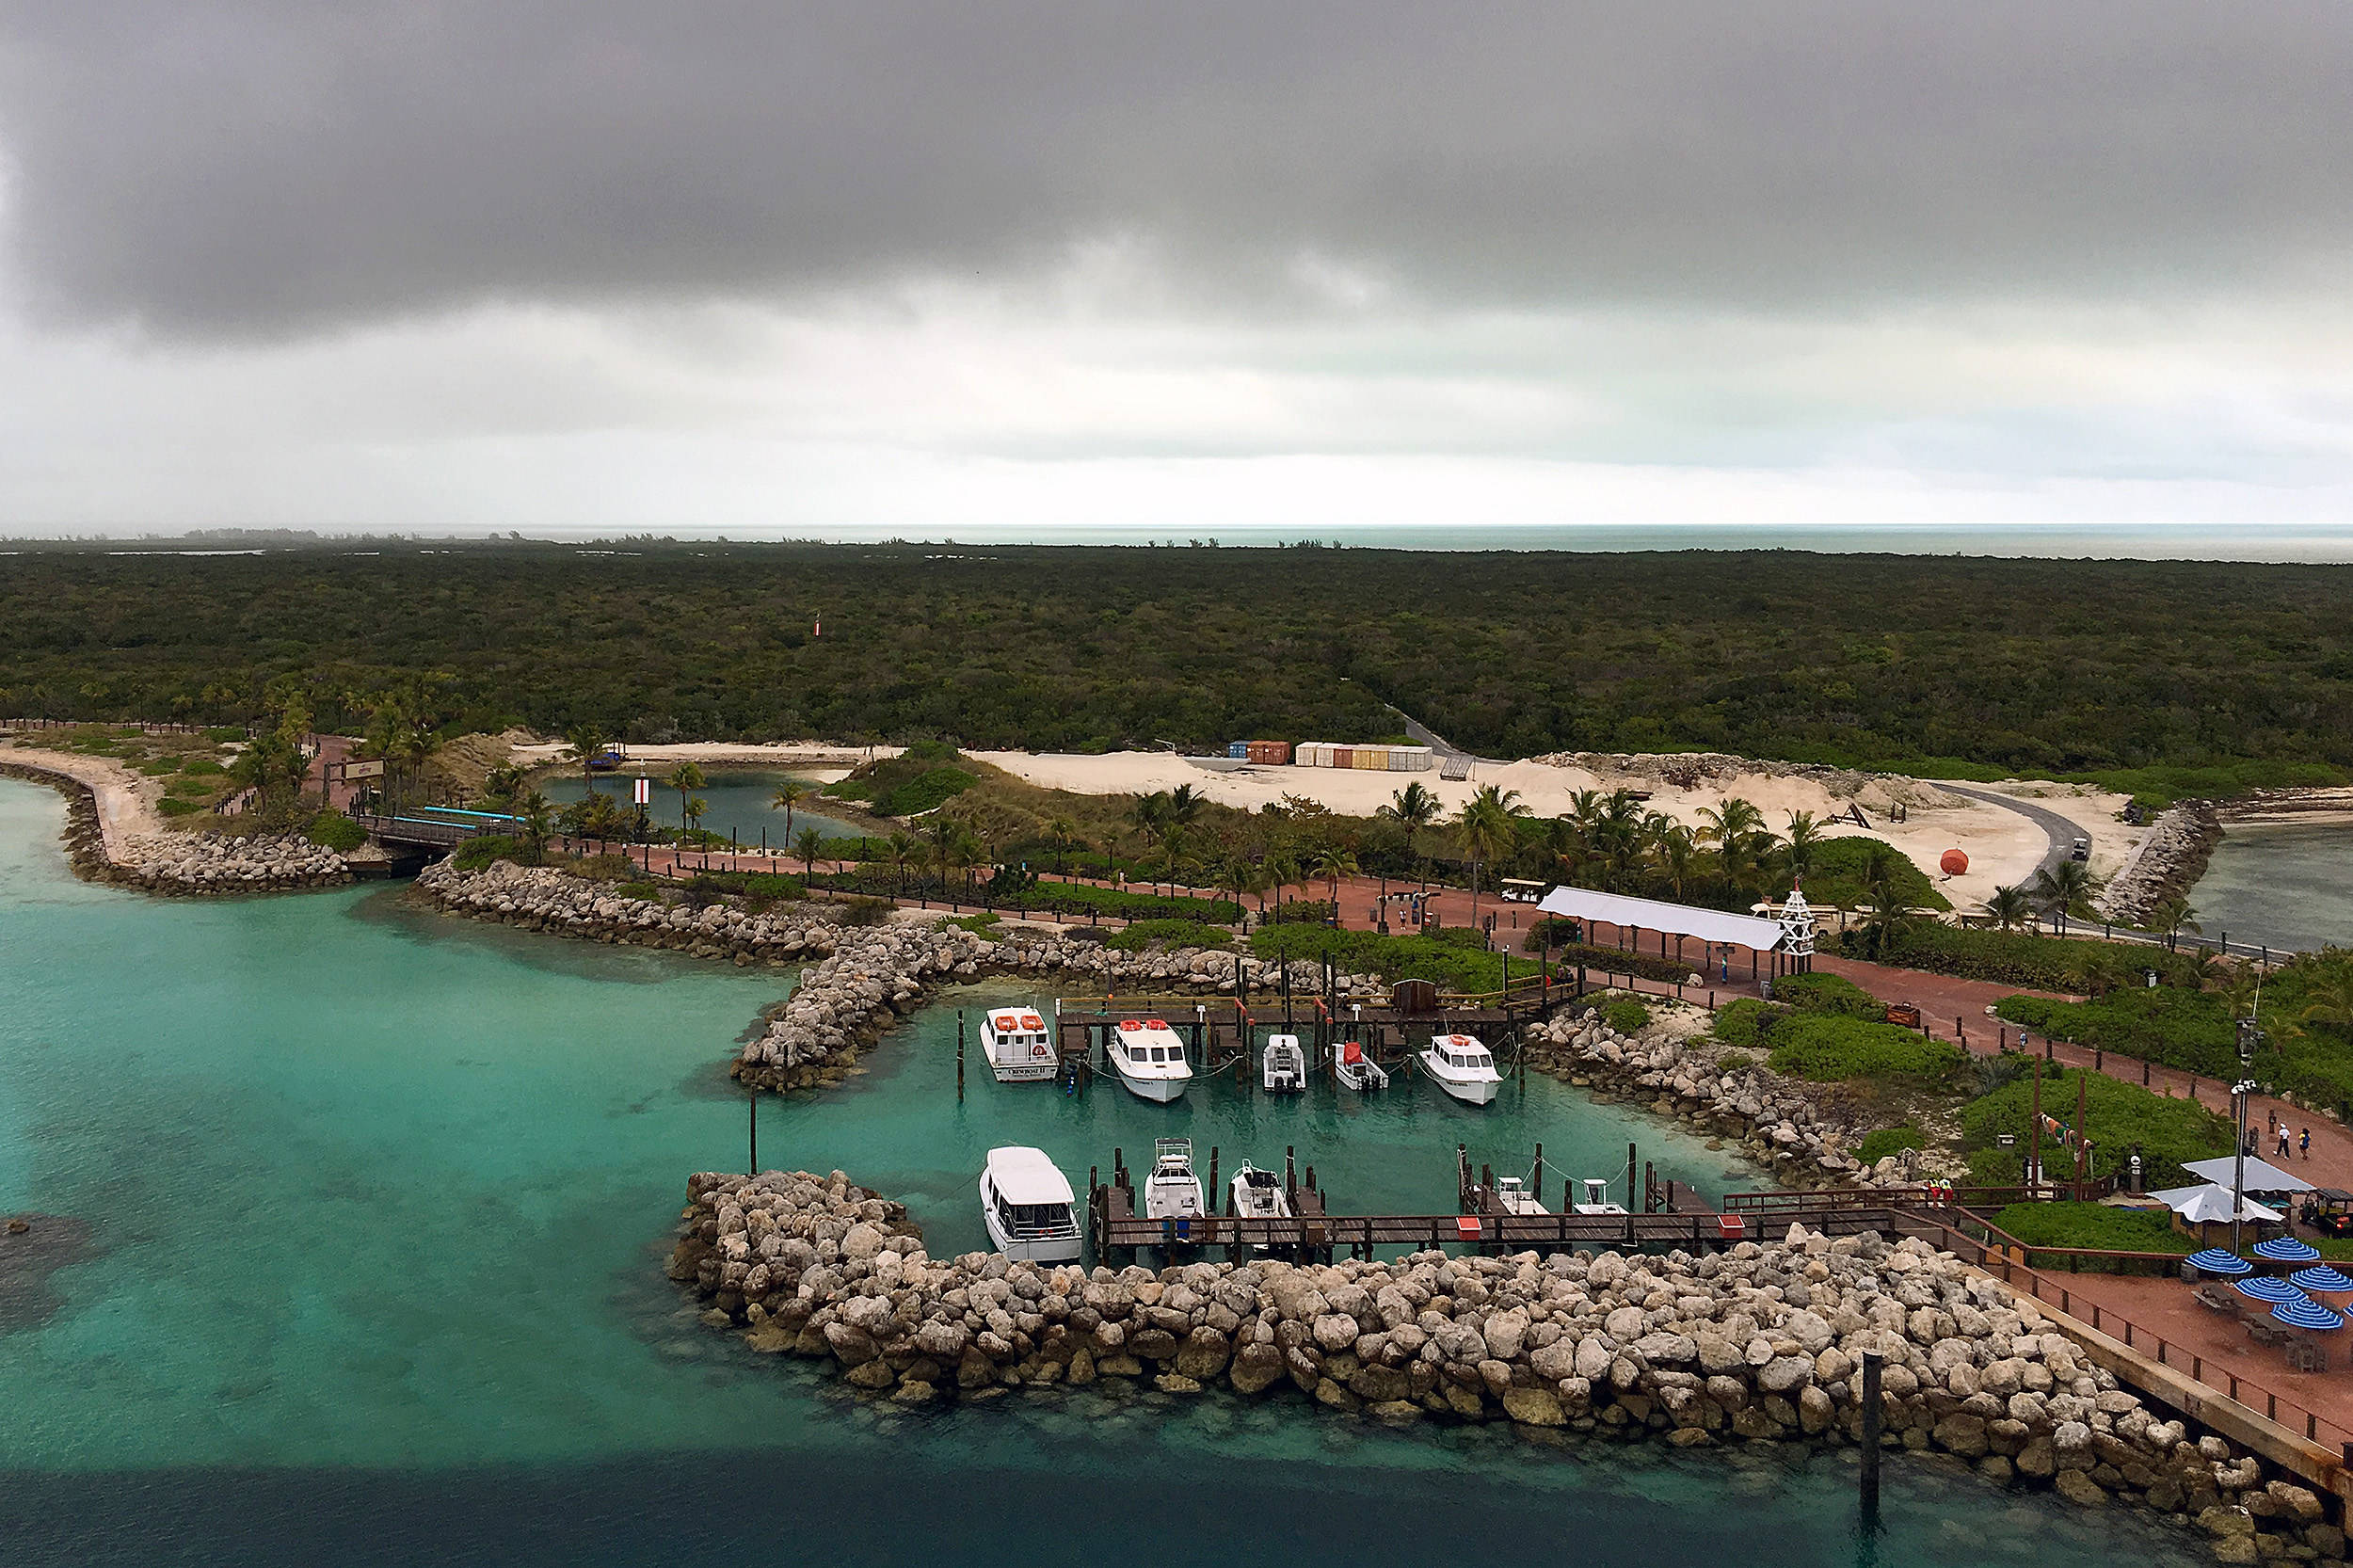 Cloudy Castaway Cay